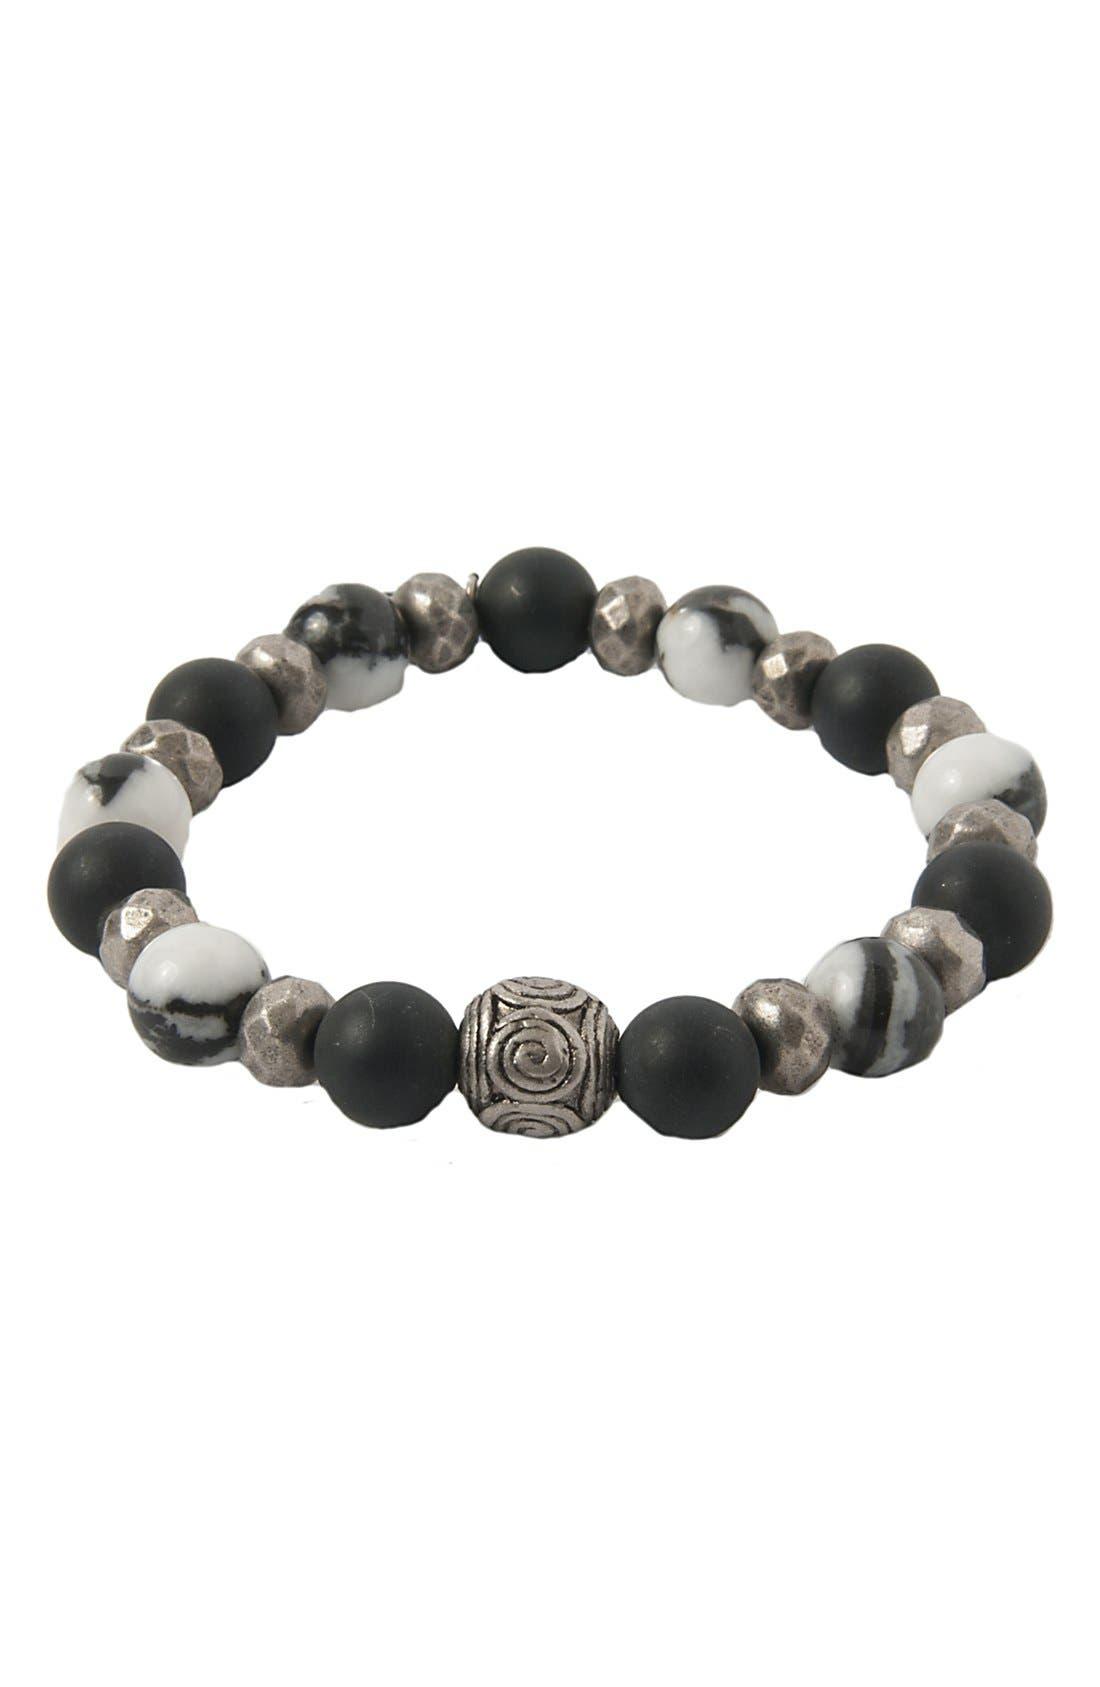 ETTIKA Mr. Ettika Silver & Agate Stretch Bracelet